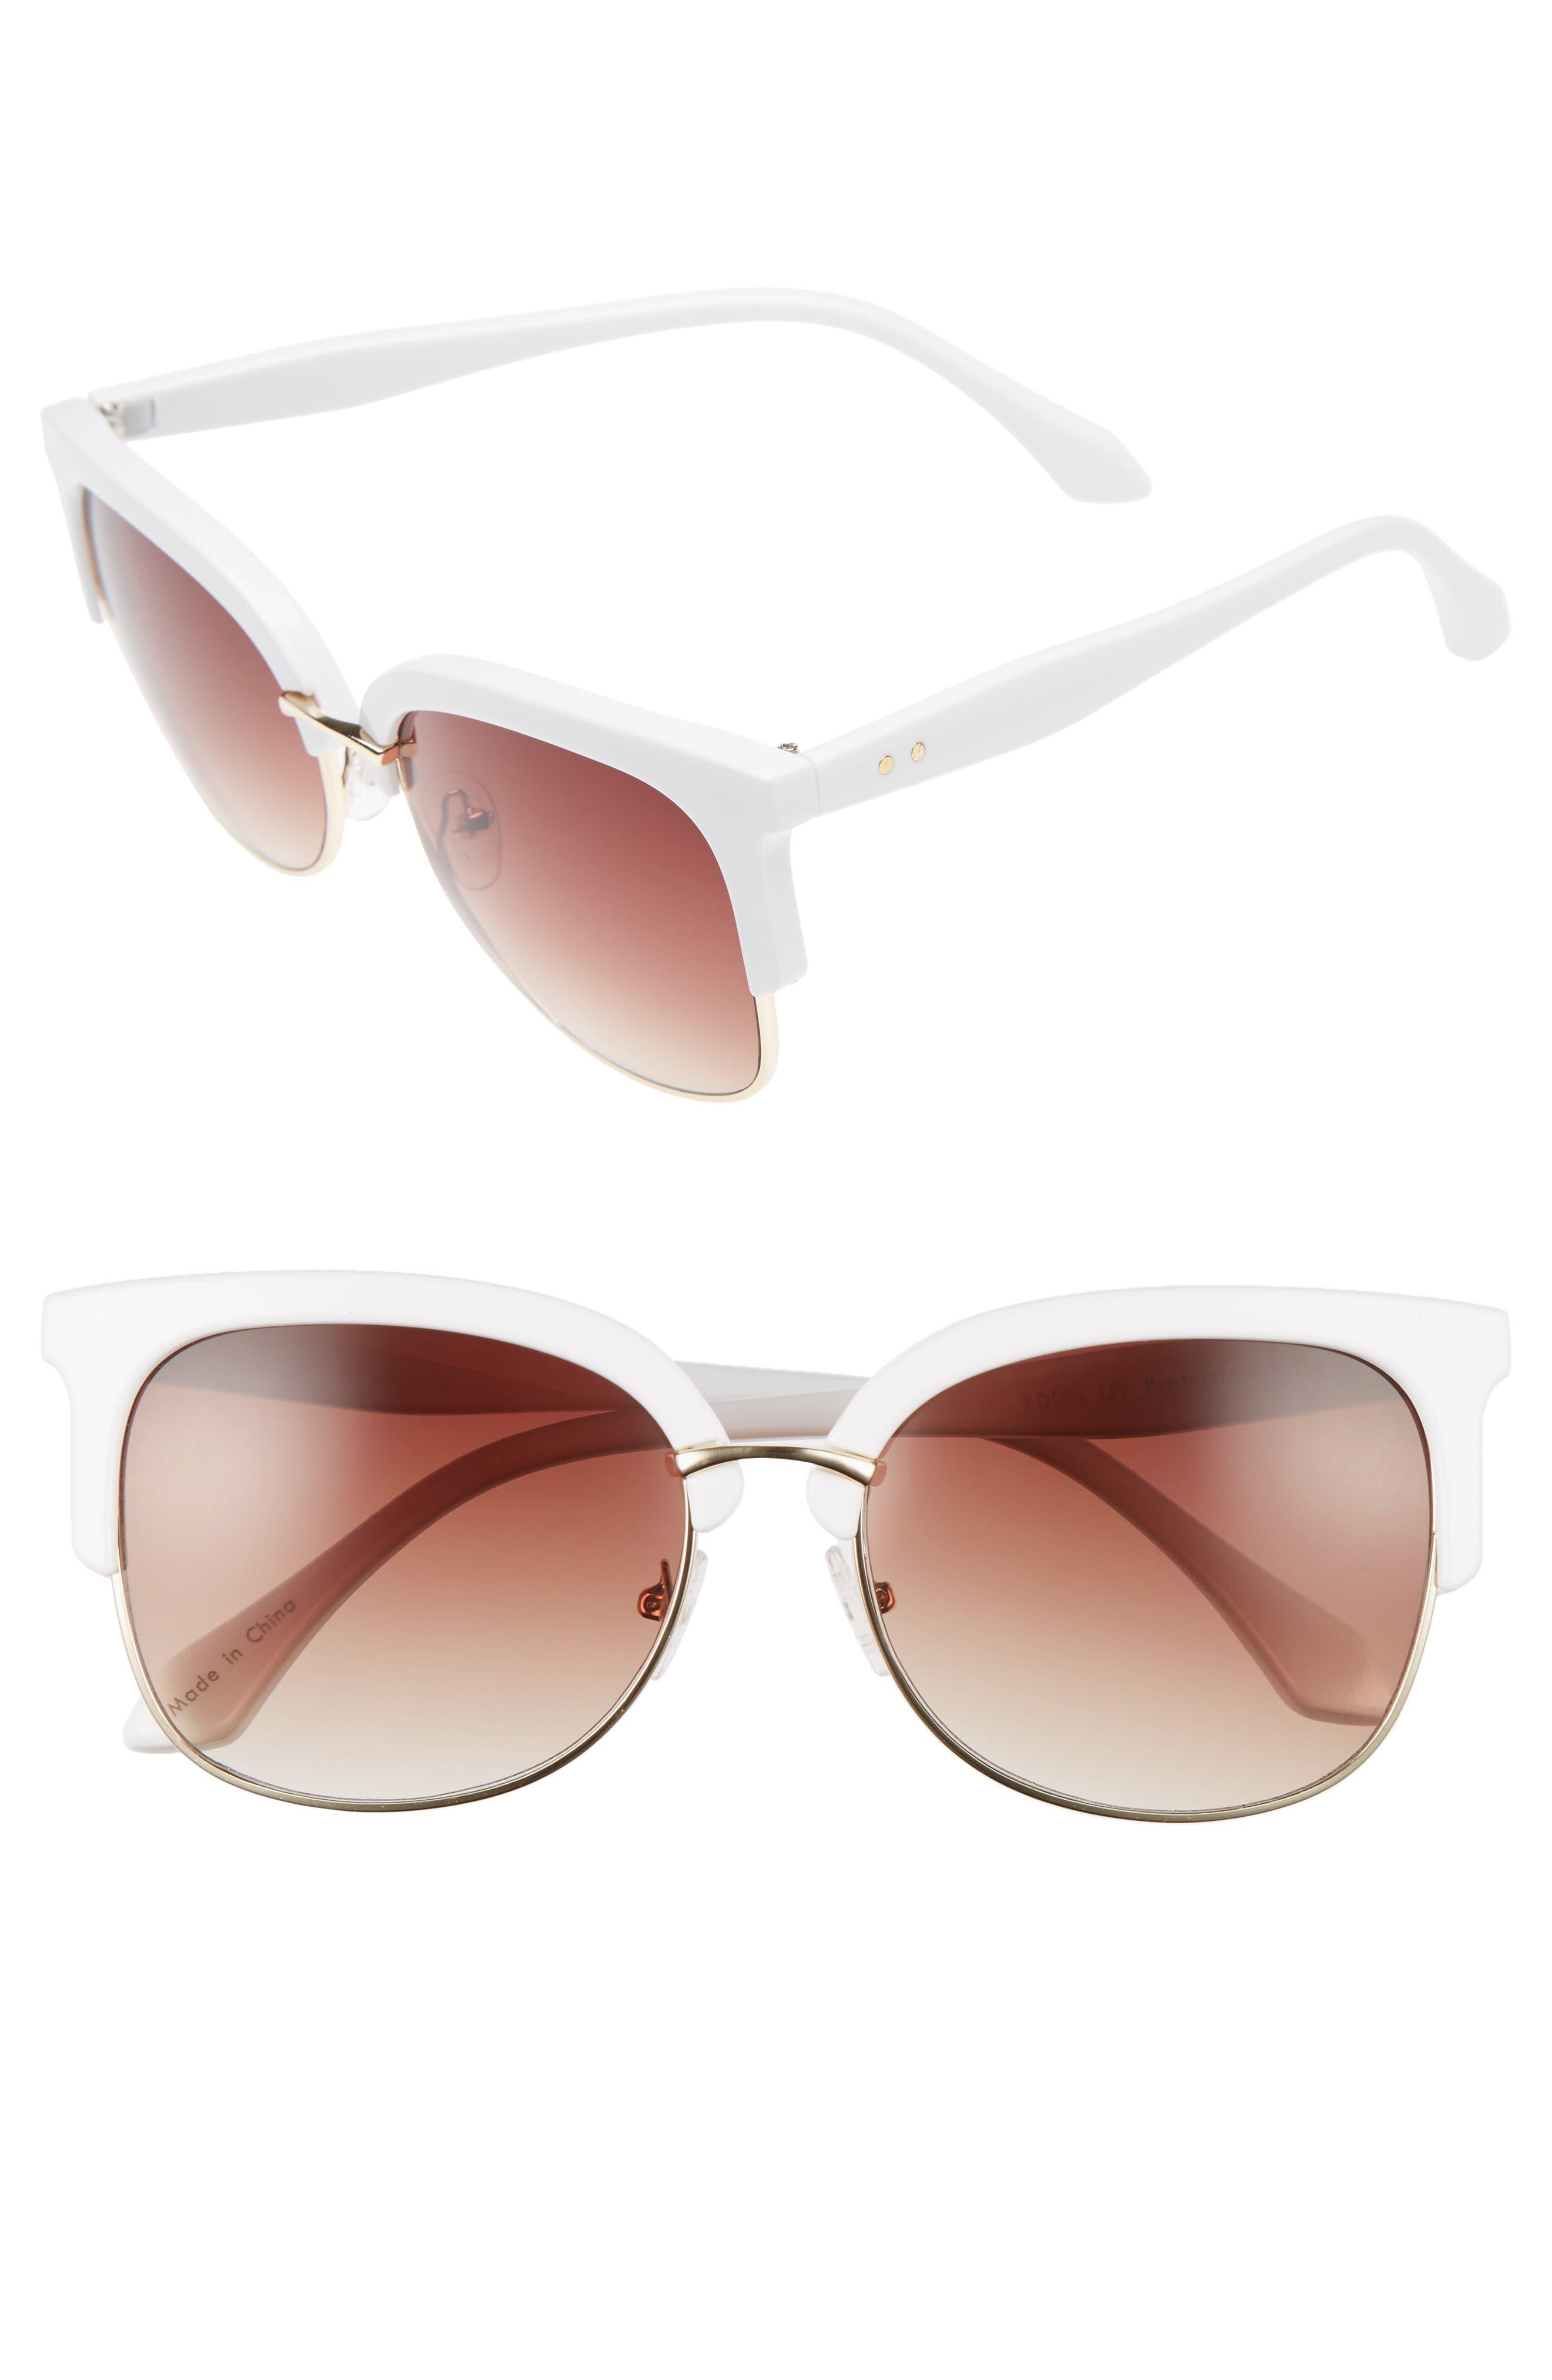 Main Image - BP. 55mm Square Sunglasses